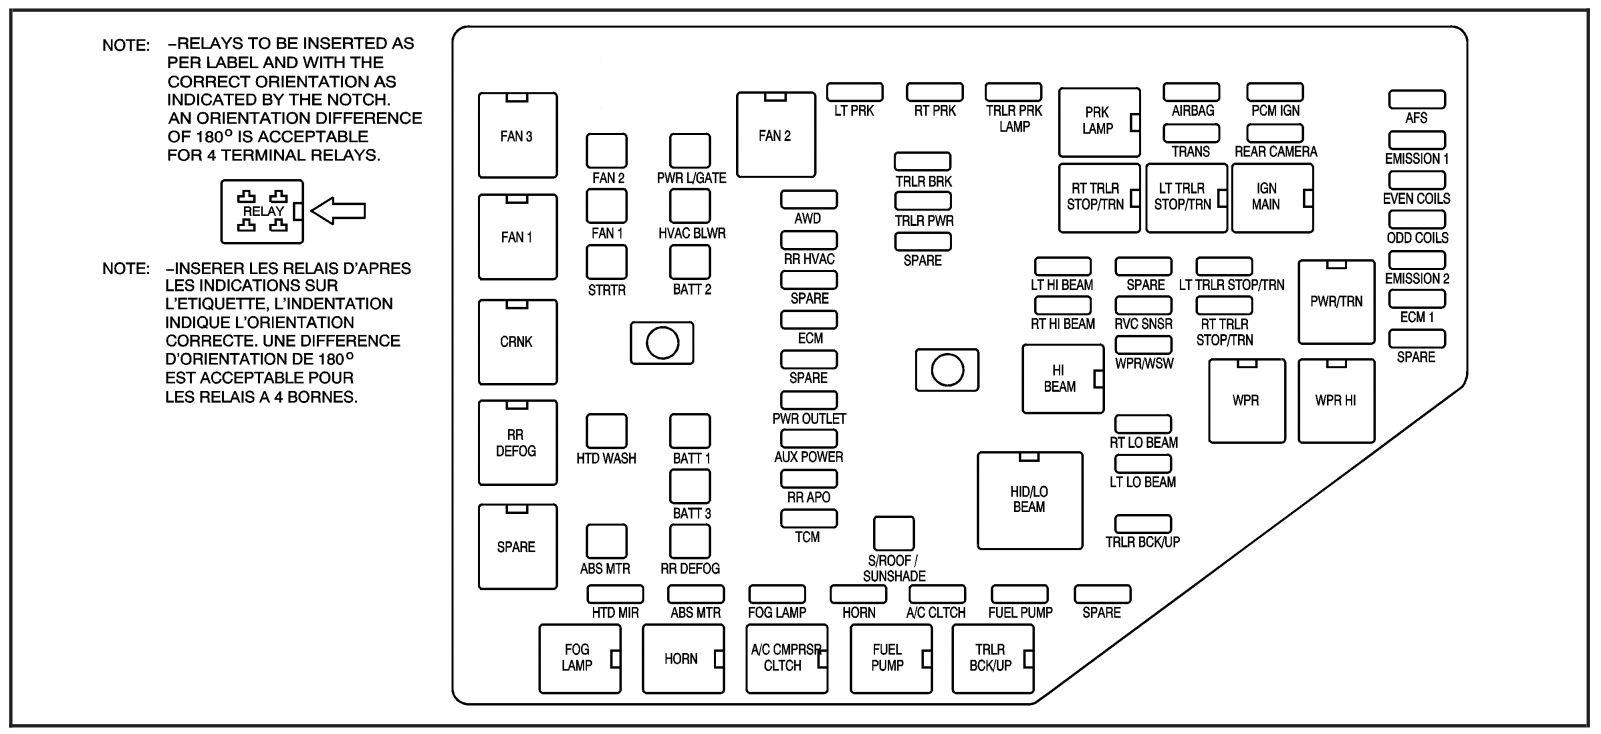 2012 Gmc Savana Fuse Box Simple Wiring Diagram F650 Schema Diagrams Ford